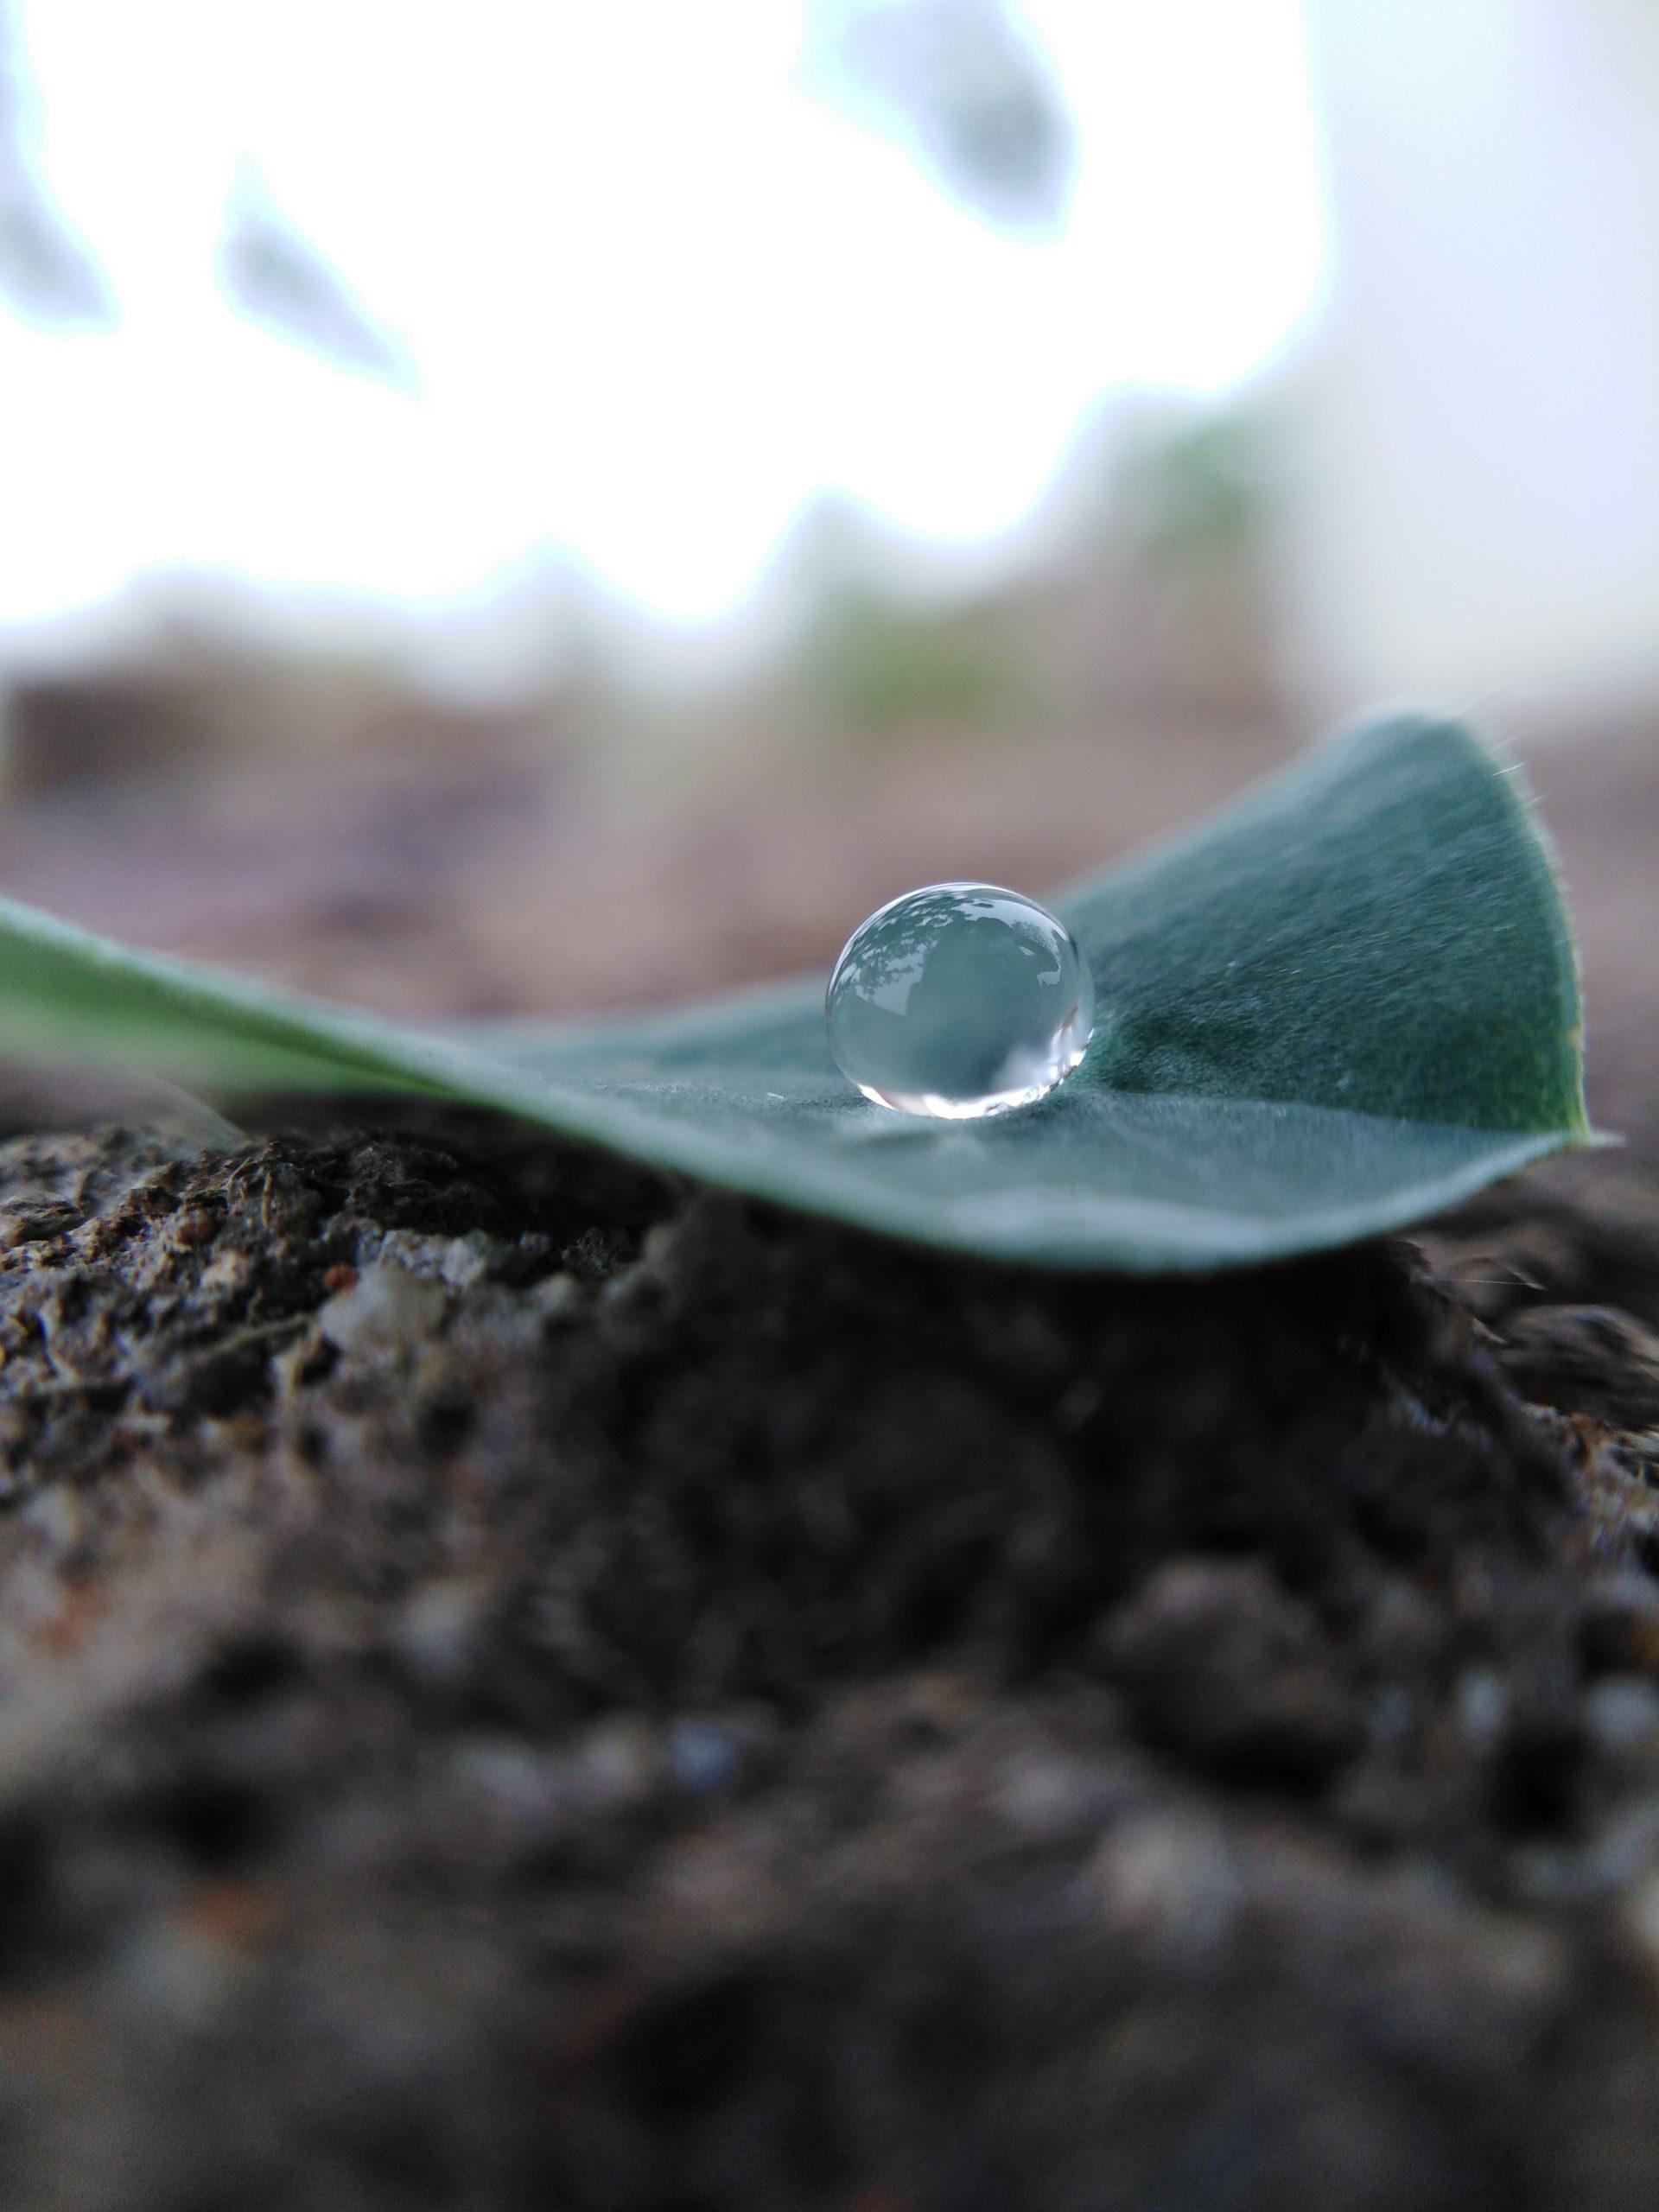 A water drop on a leaf